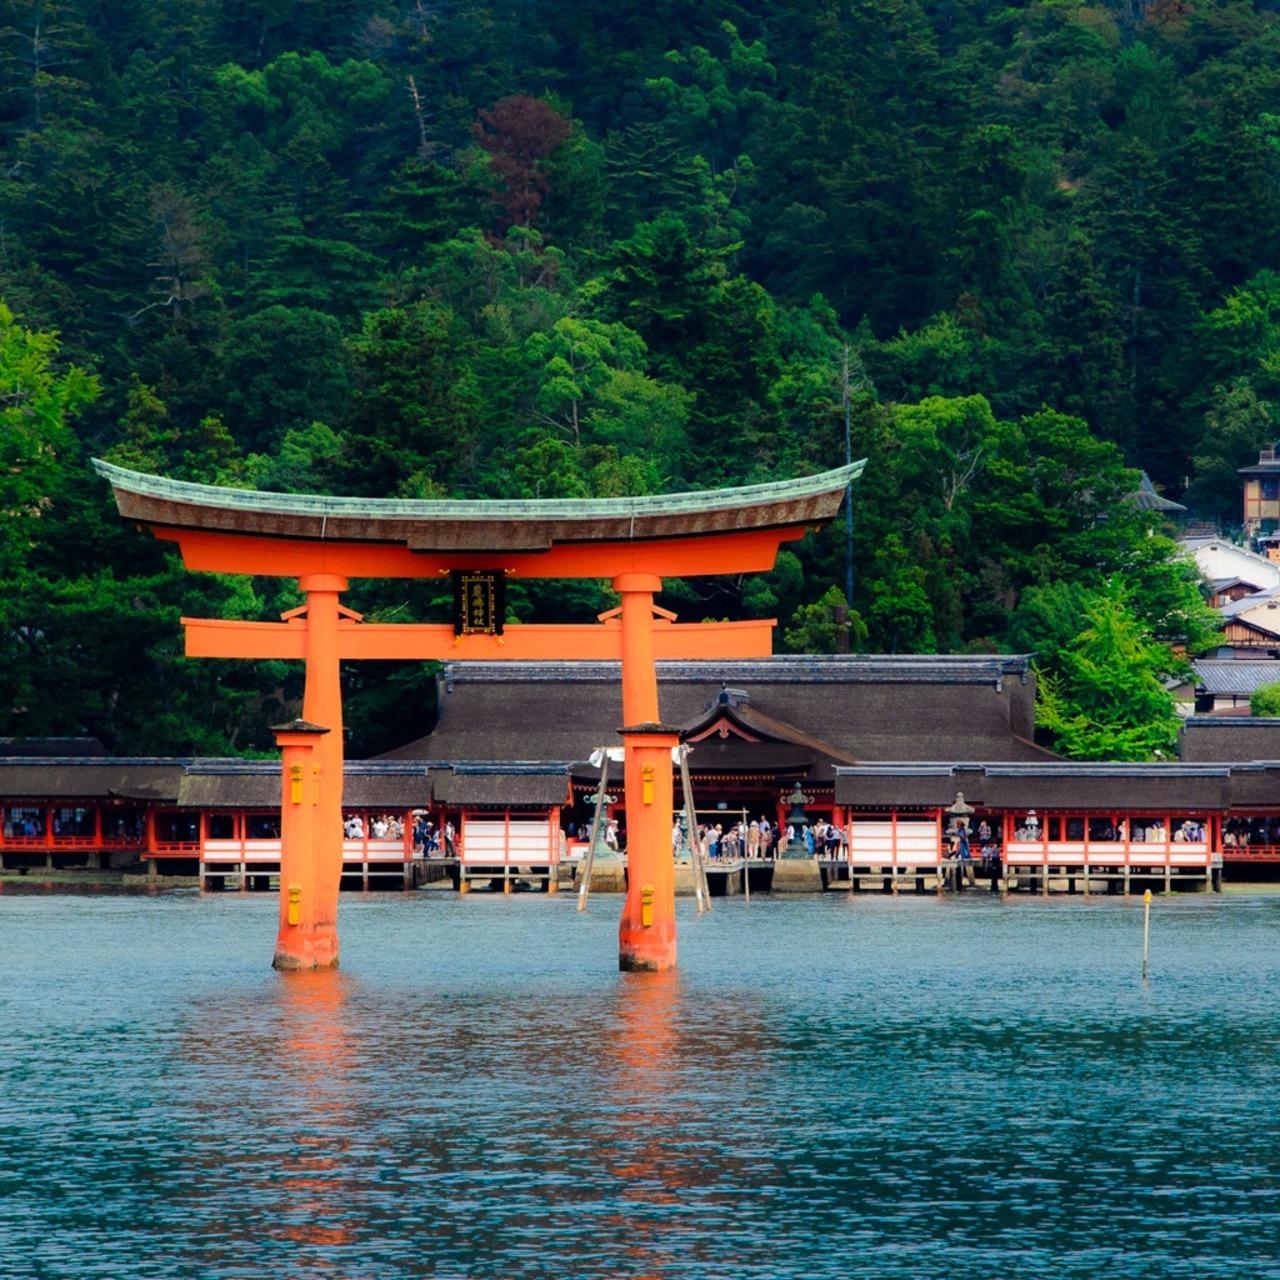 厳島神社の画像 p1_39